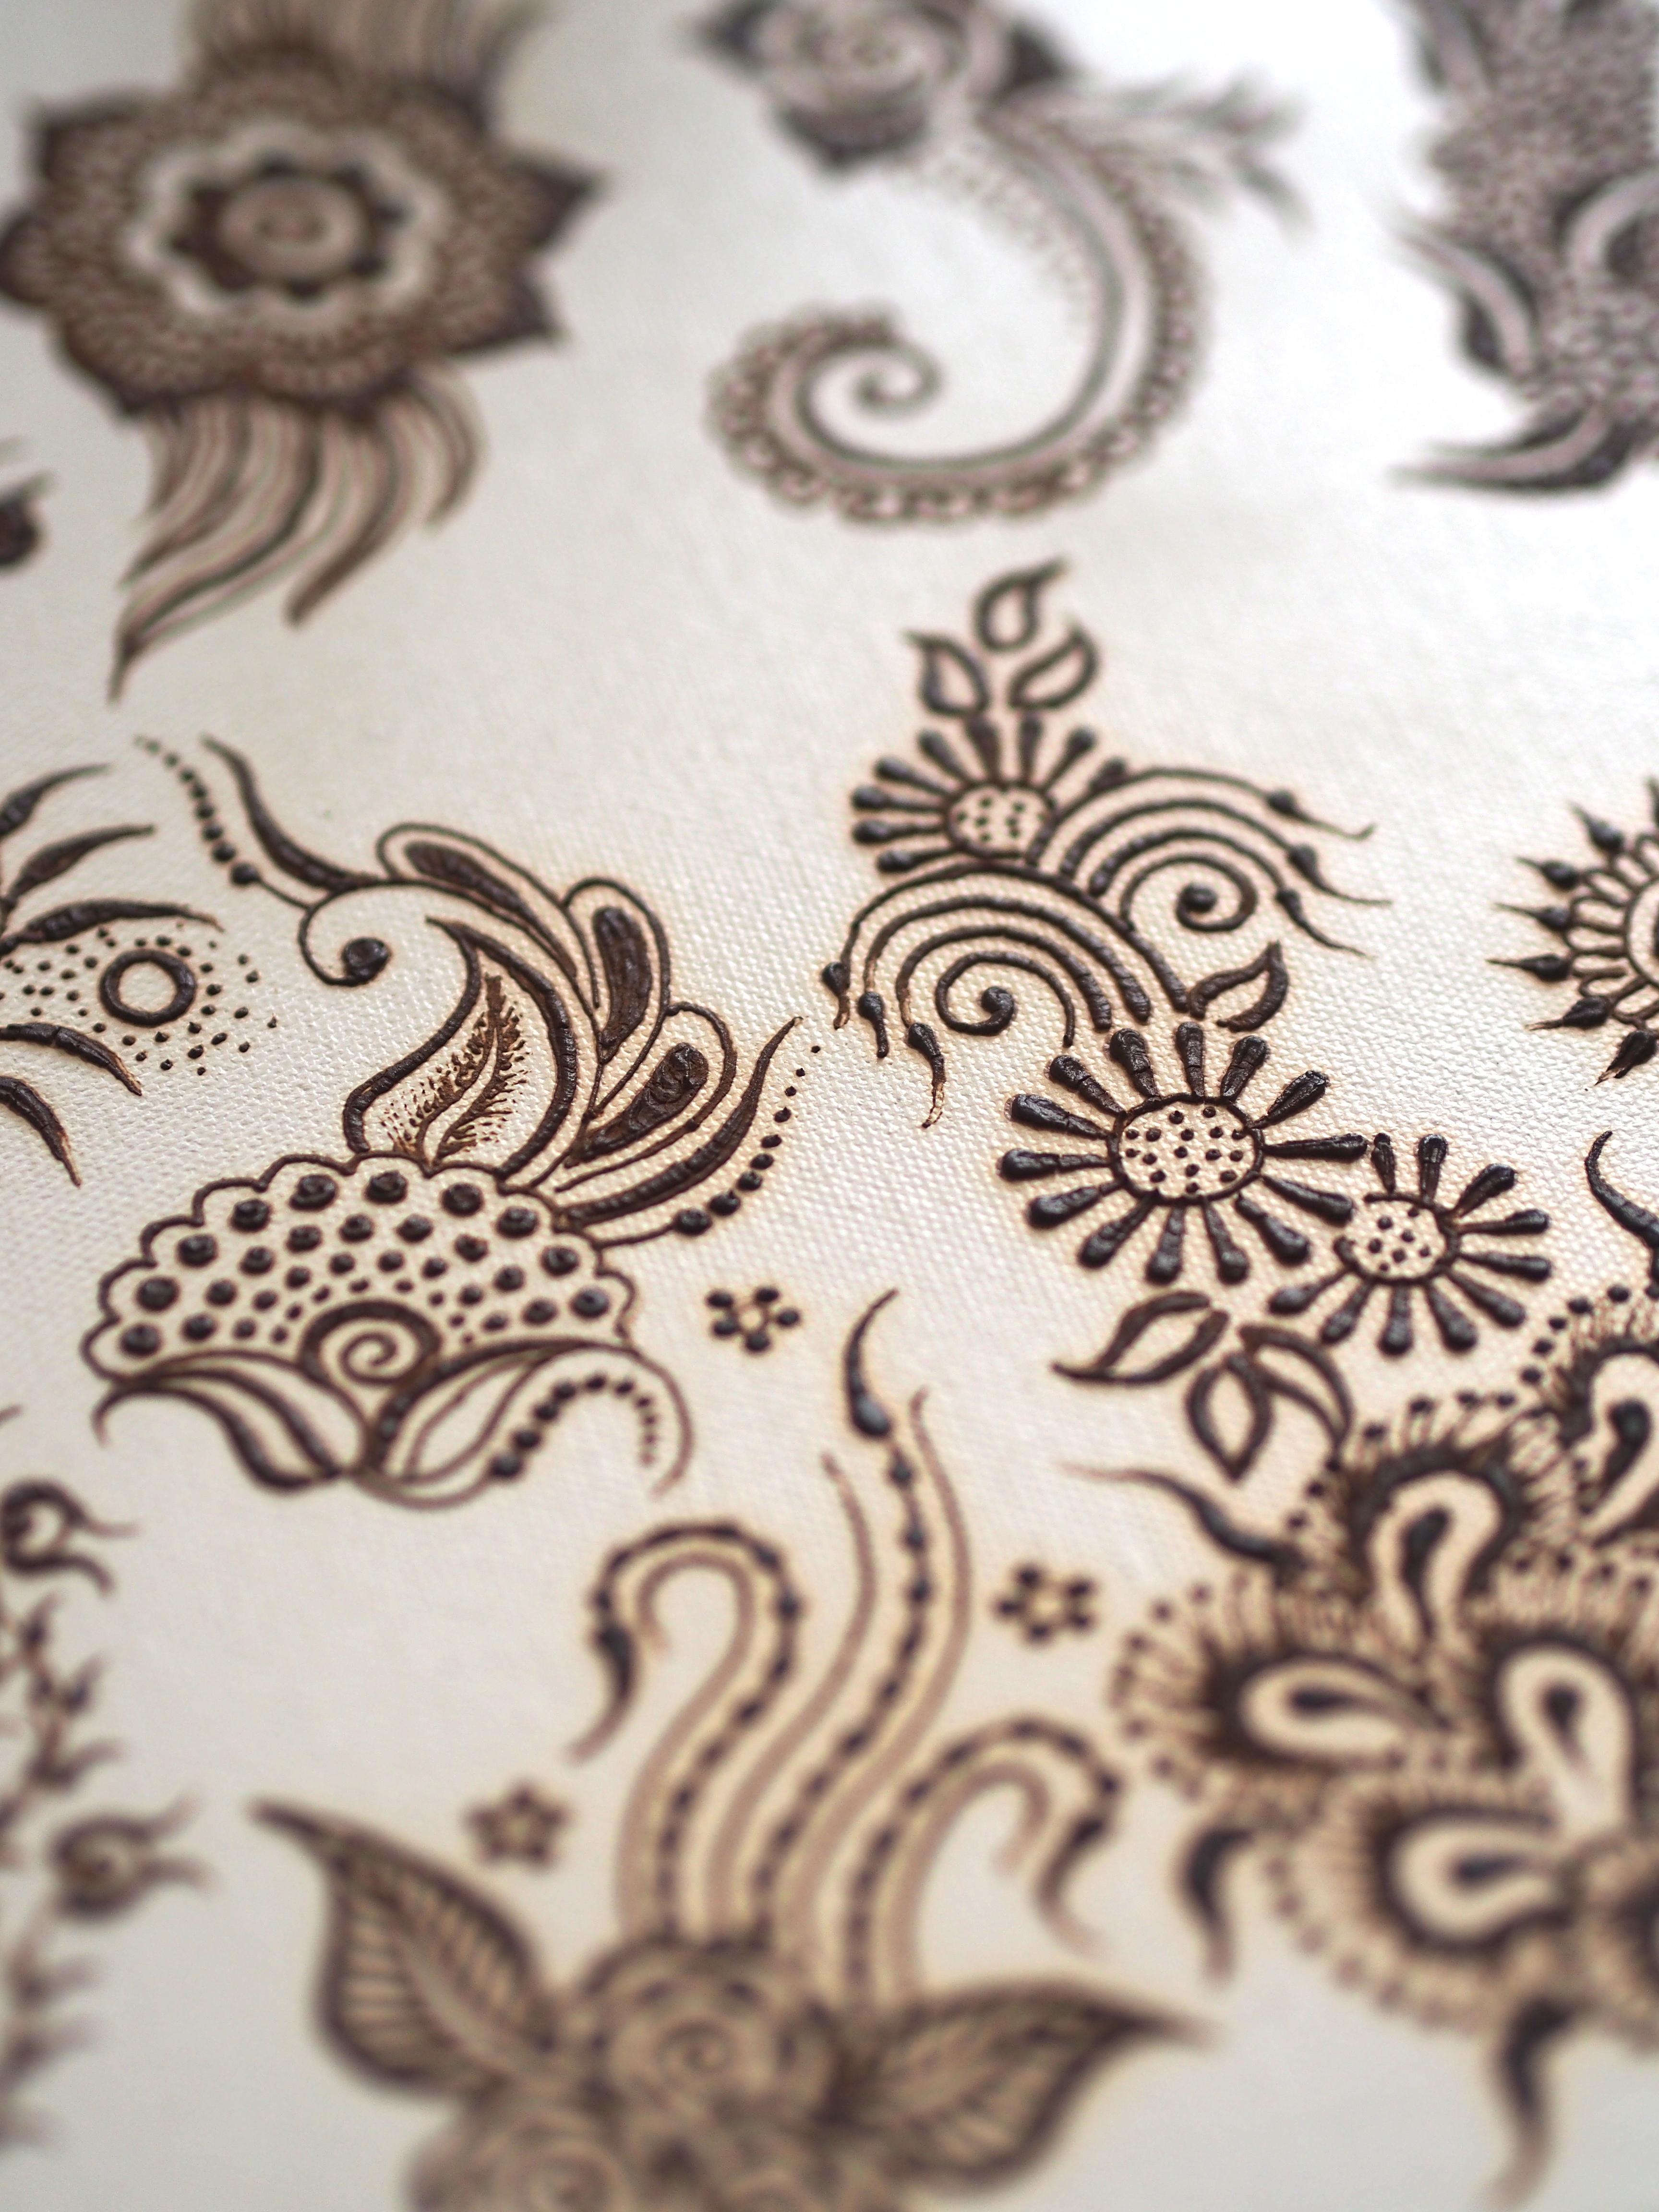 Motifs in Persian Gulf henna